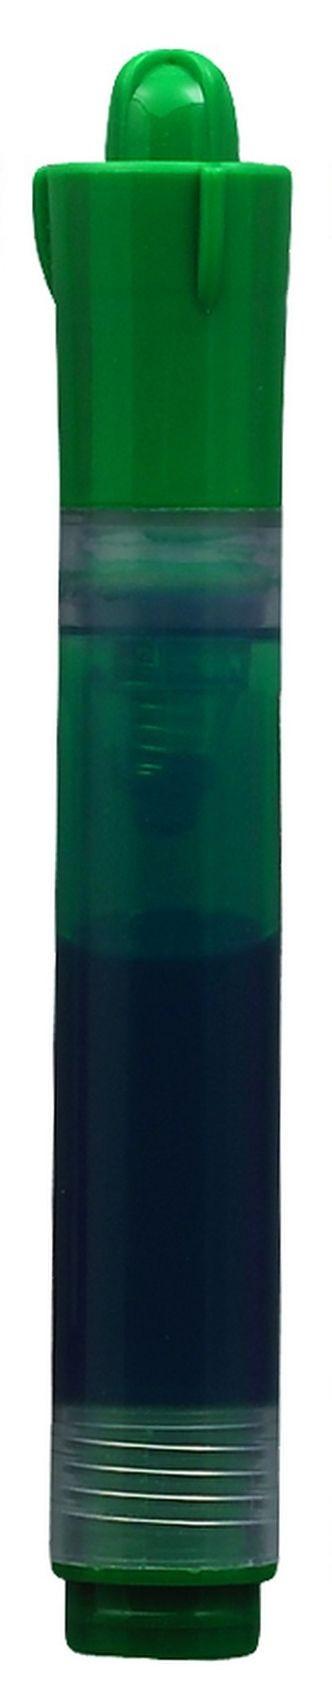 Winco MBM-G Deluxe Neon Marker, Green